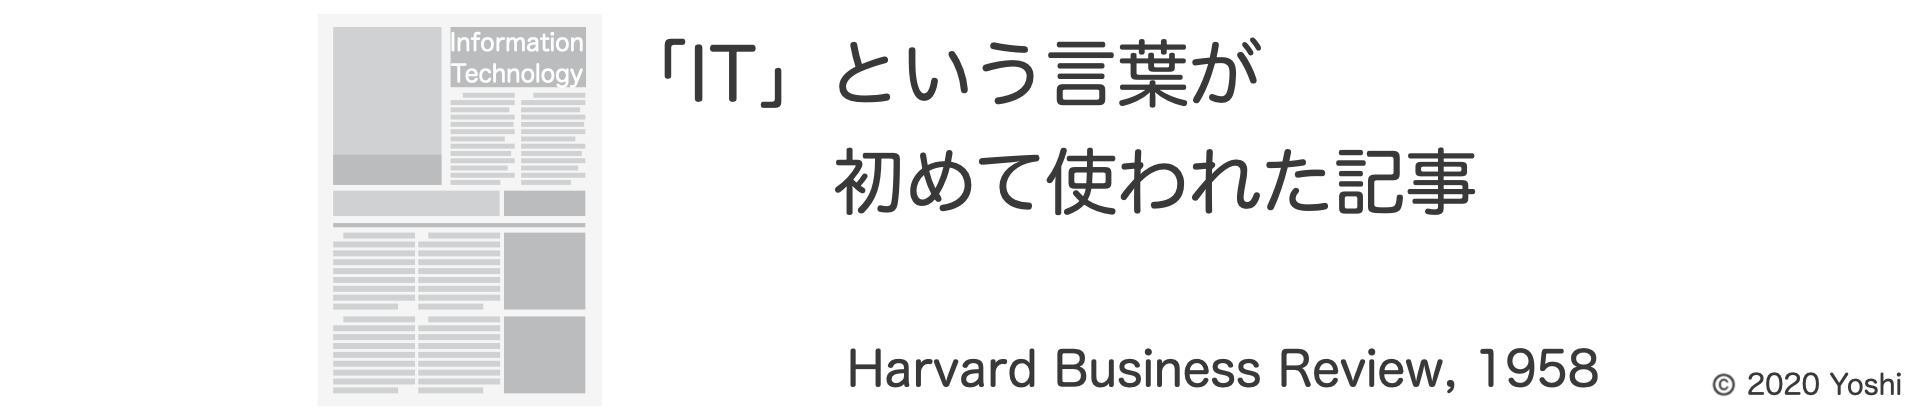 IT/情報技術という言葉が初めて使われた記事